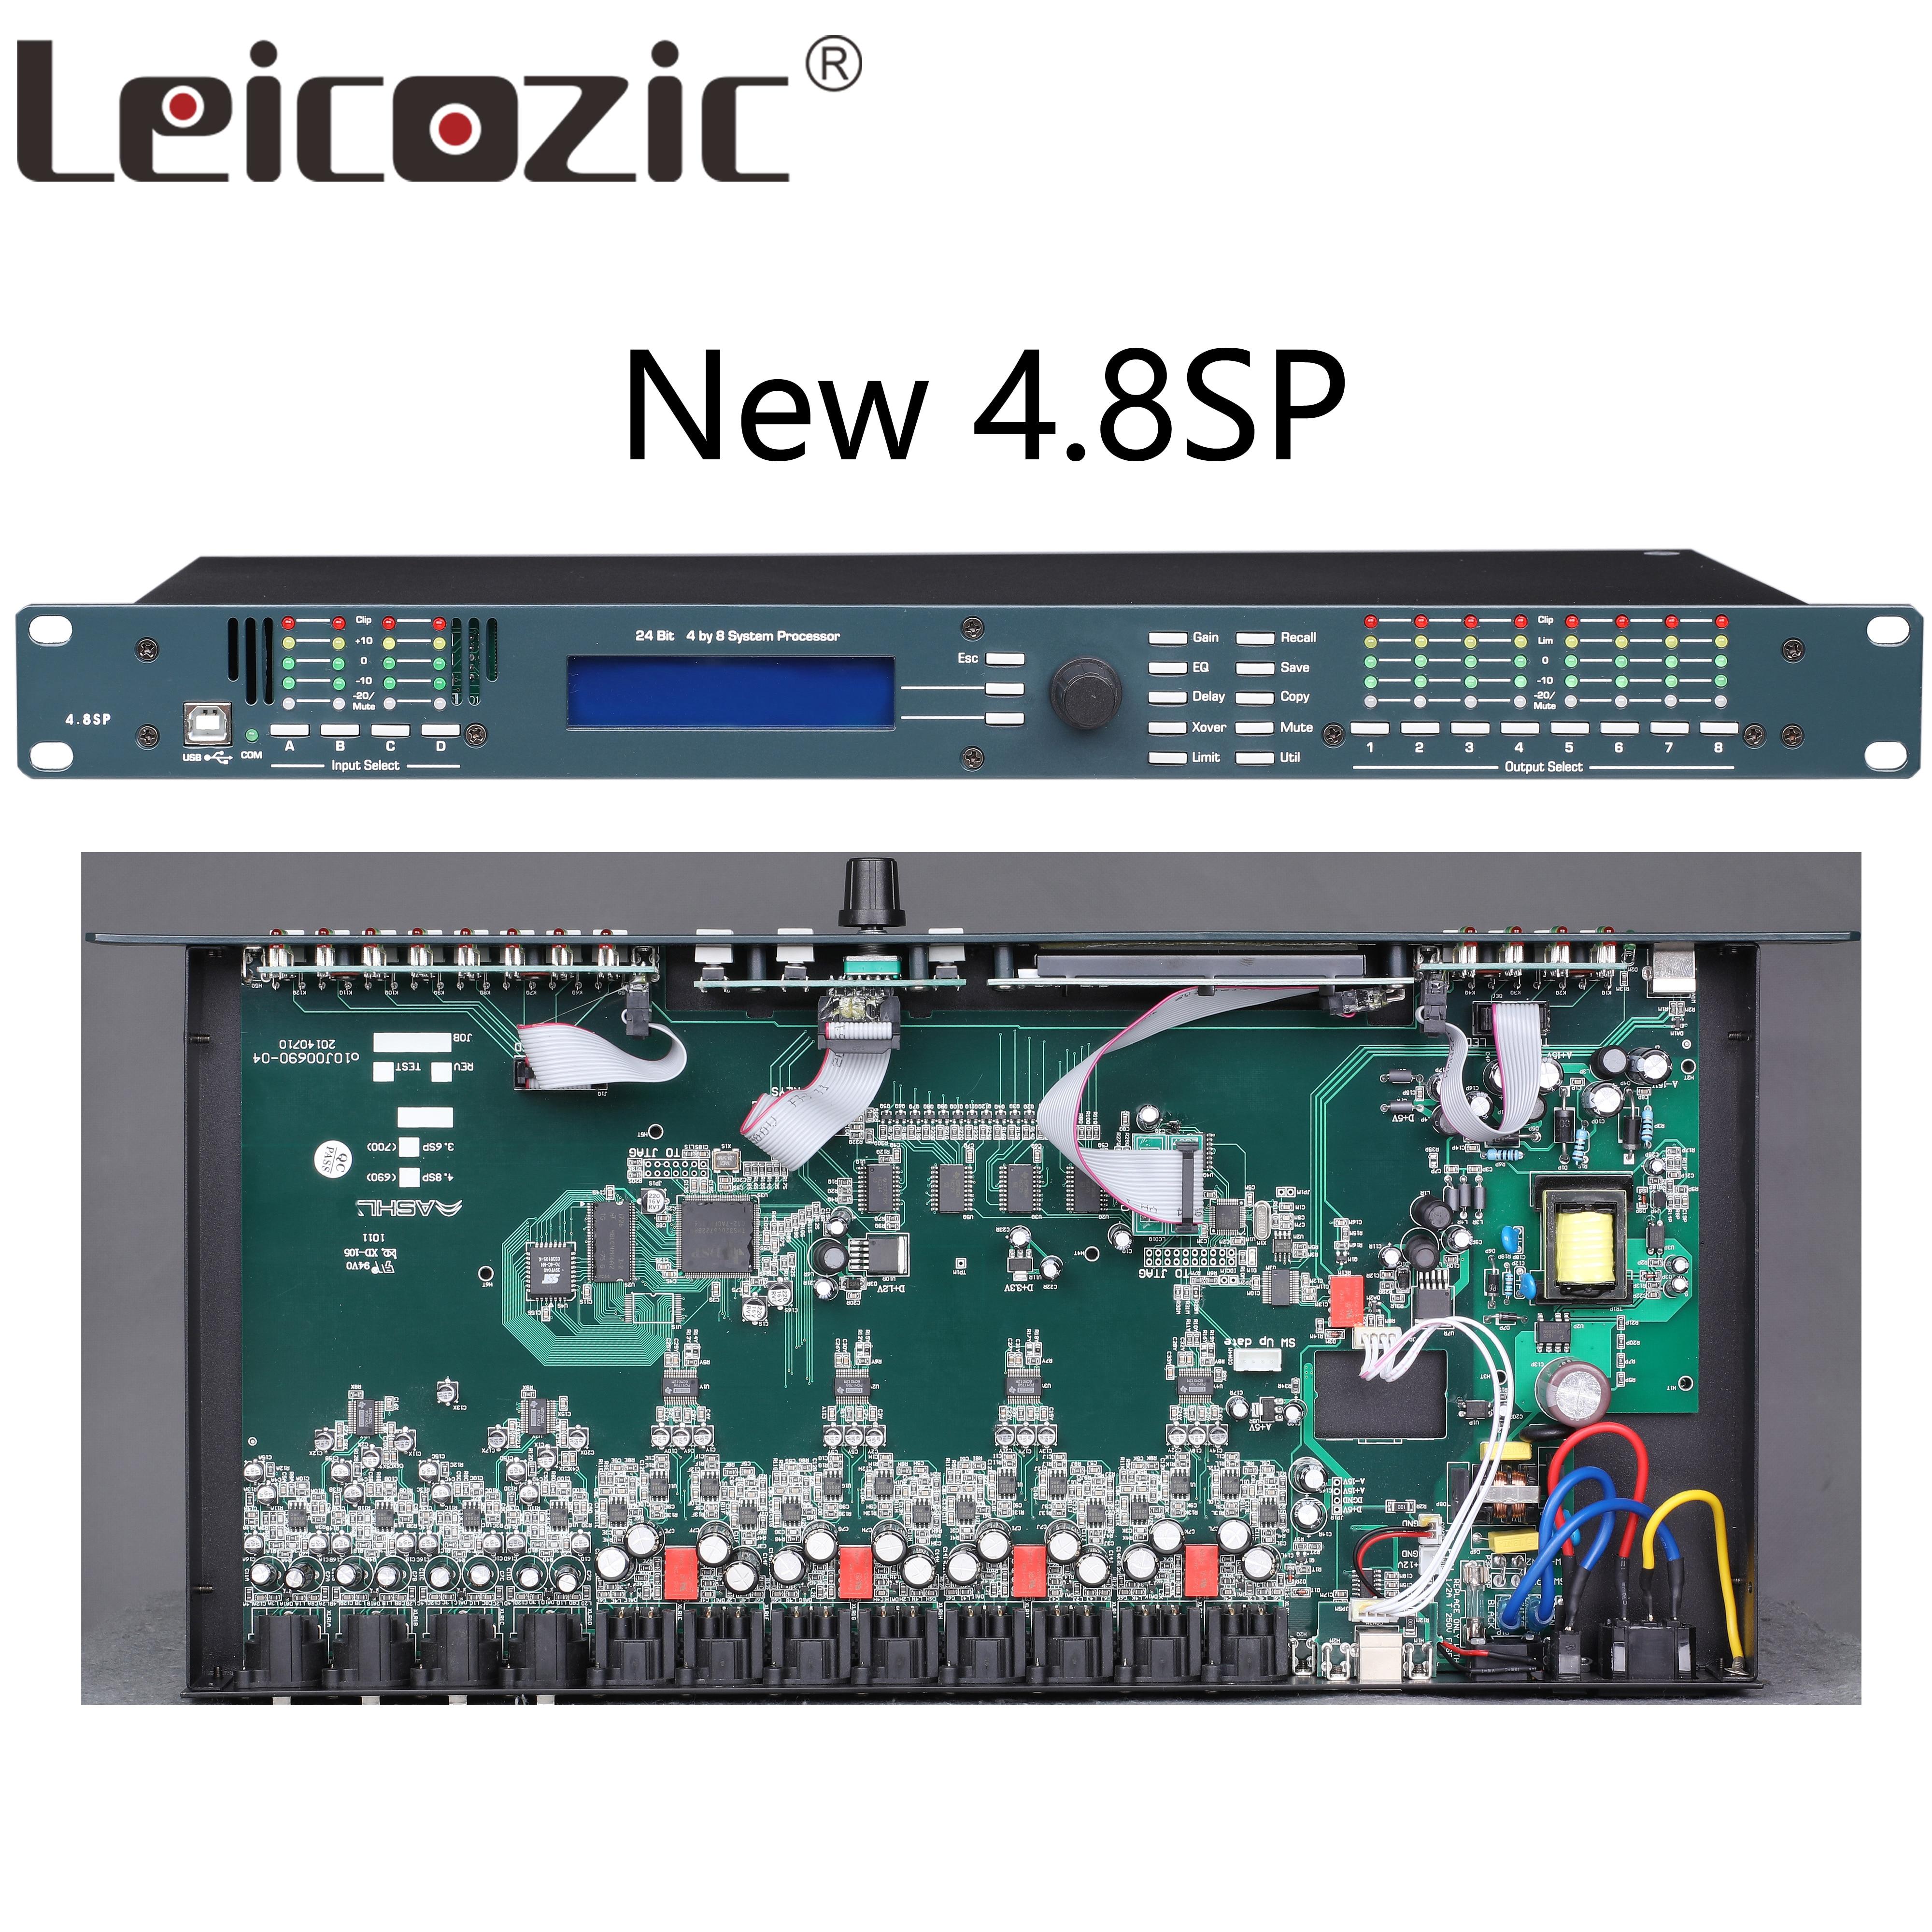 Leicozic 4in/8out 4.8SP Professional Digital Processor speaker management pro audio processor protea pro stage audio equipment